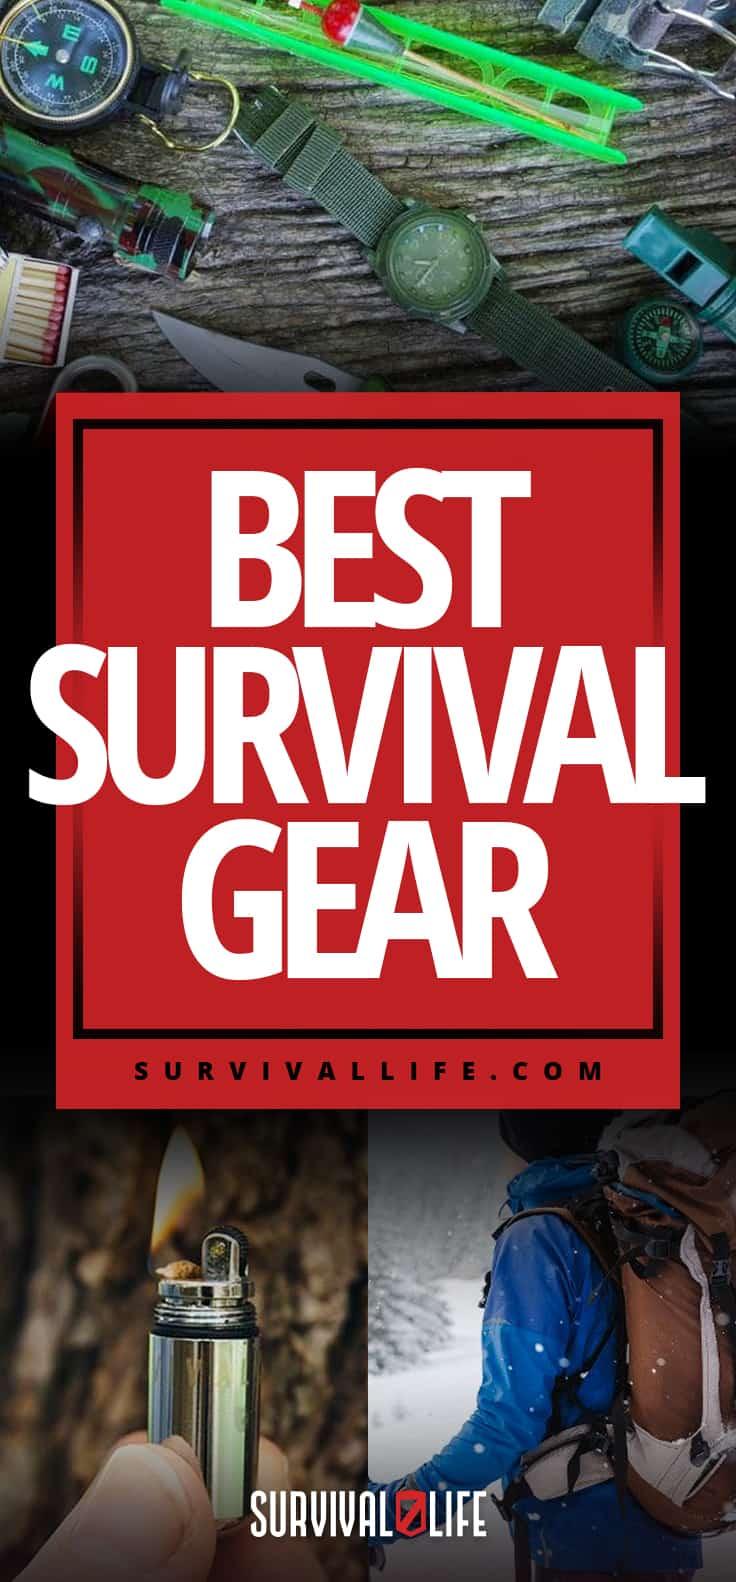 Best Survival Gear | https://survivallife.com/best-survival-gear/